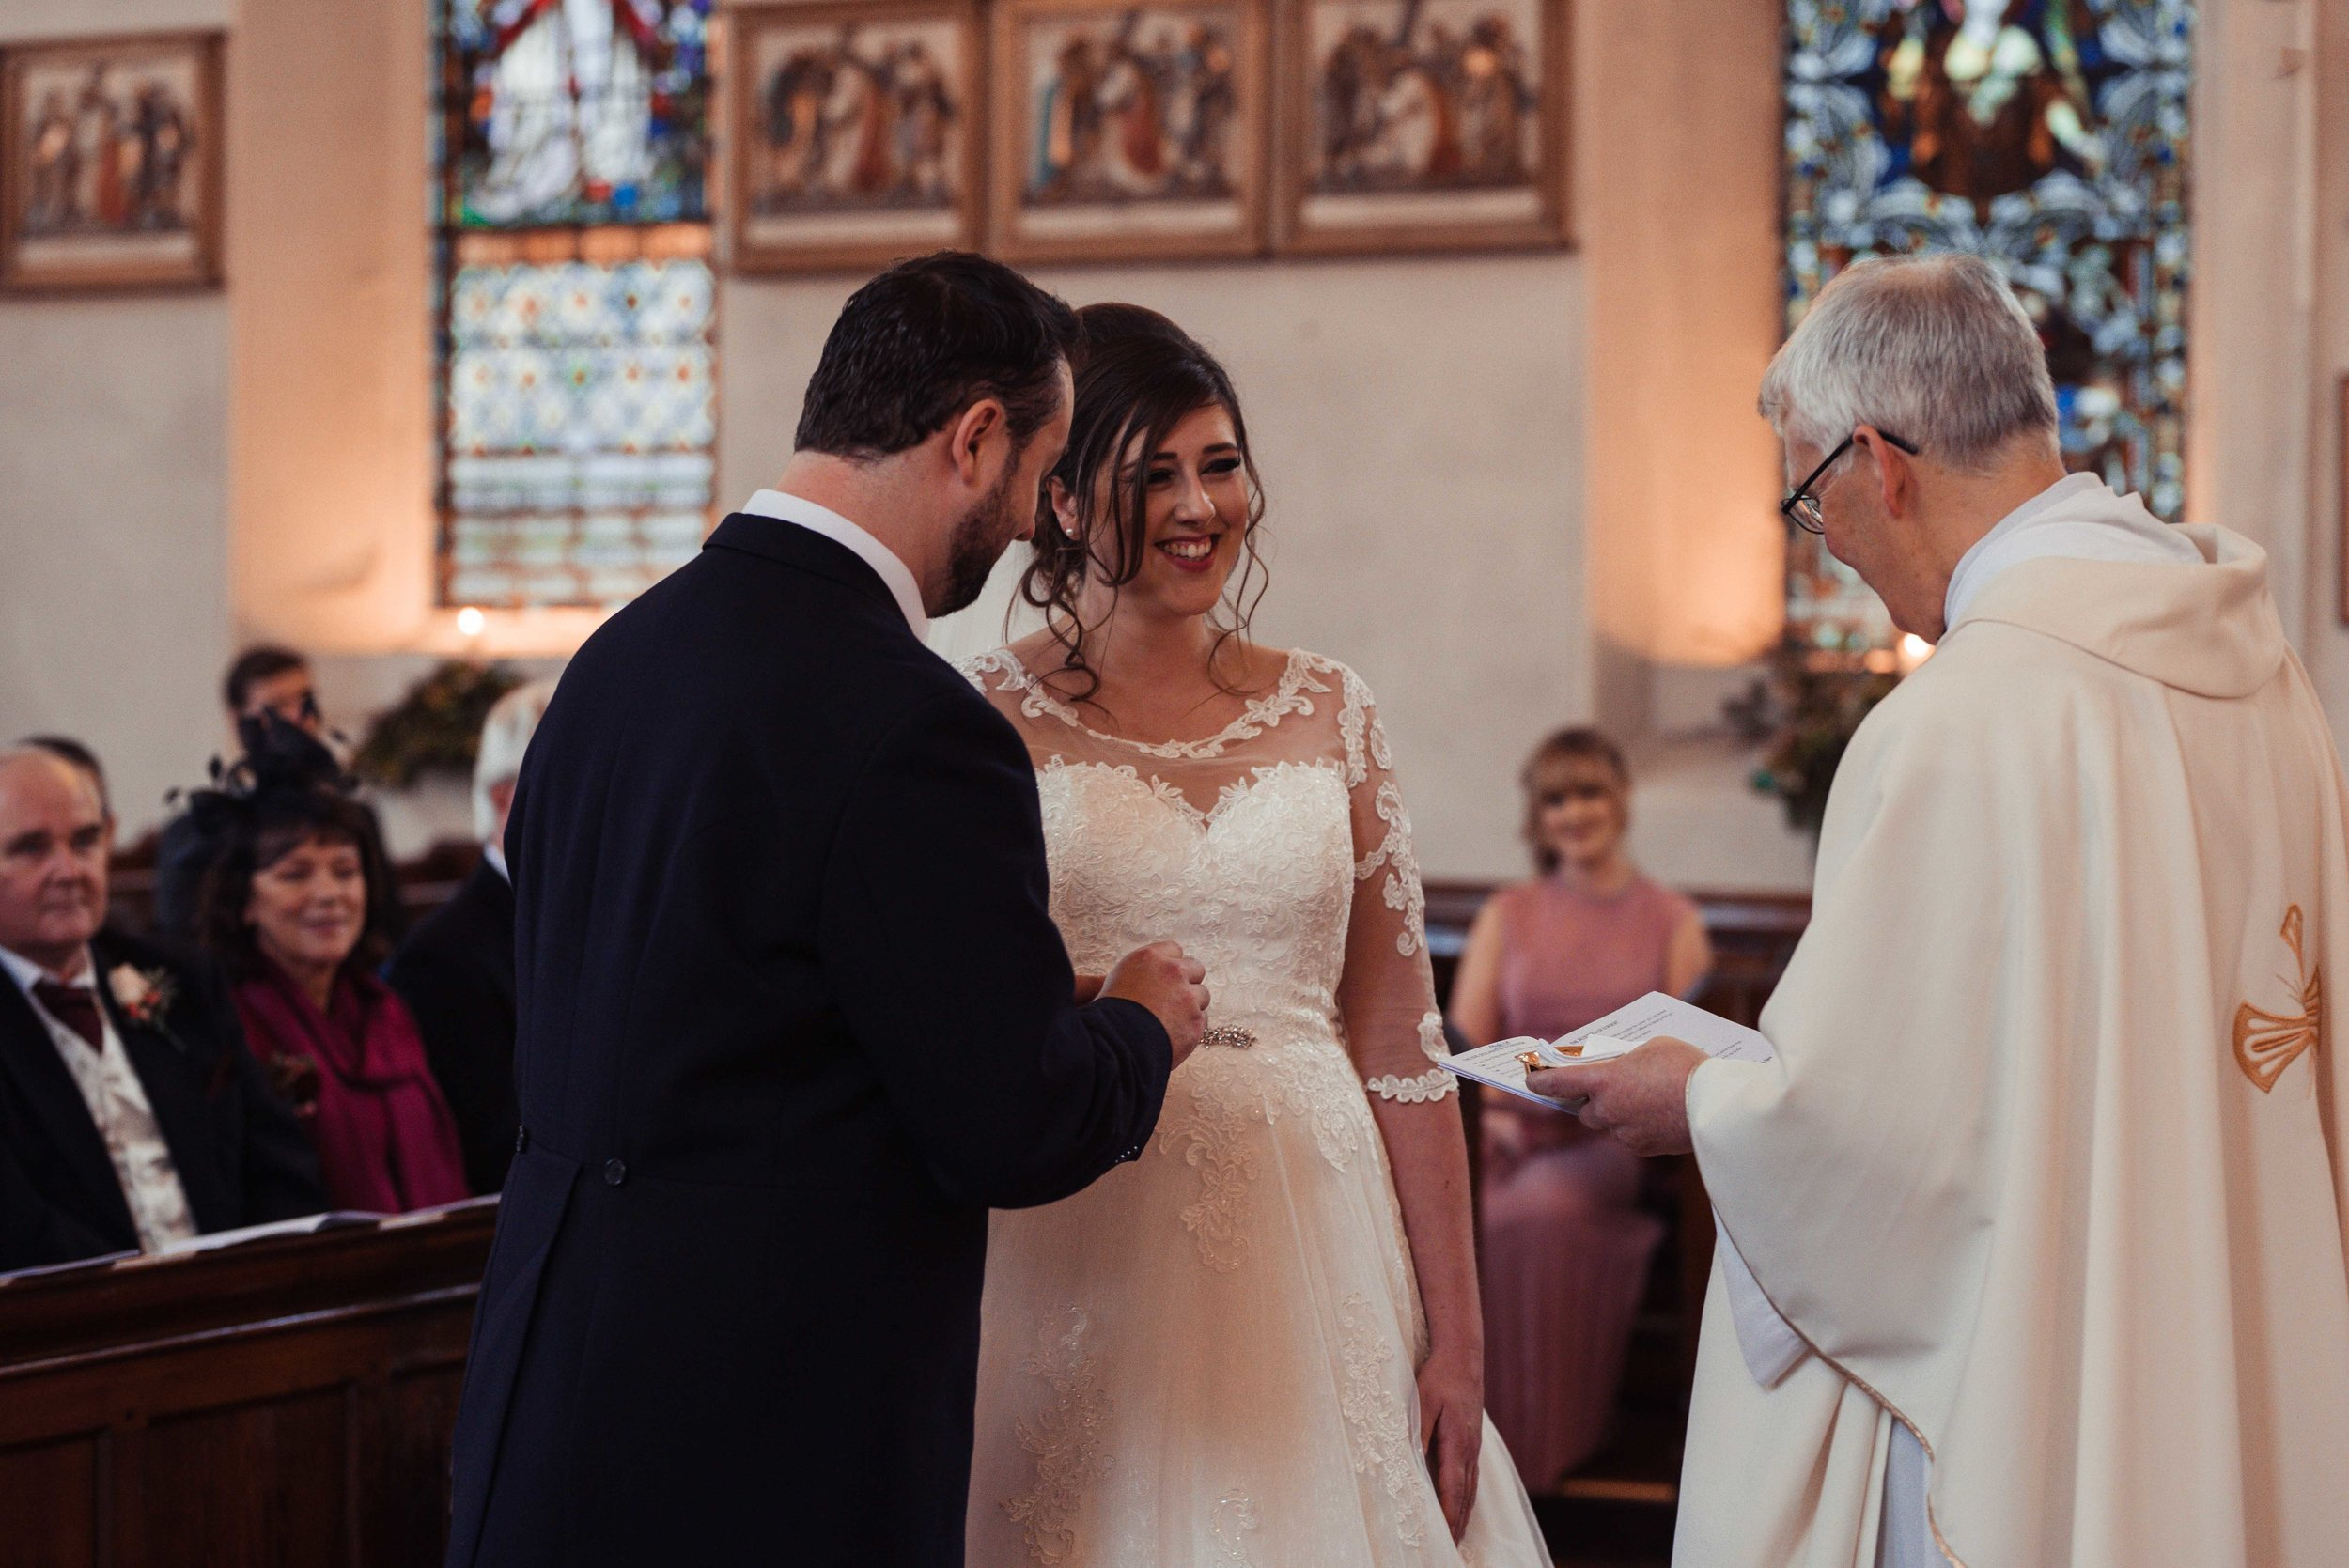 Belsfield-wedding-photography-17.jpg